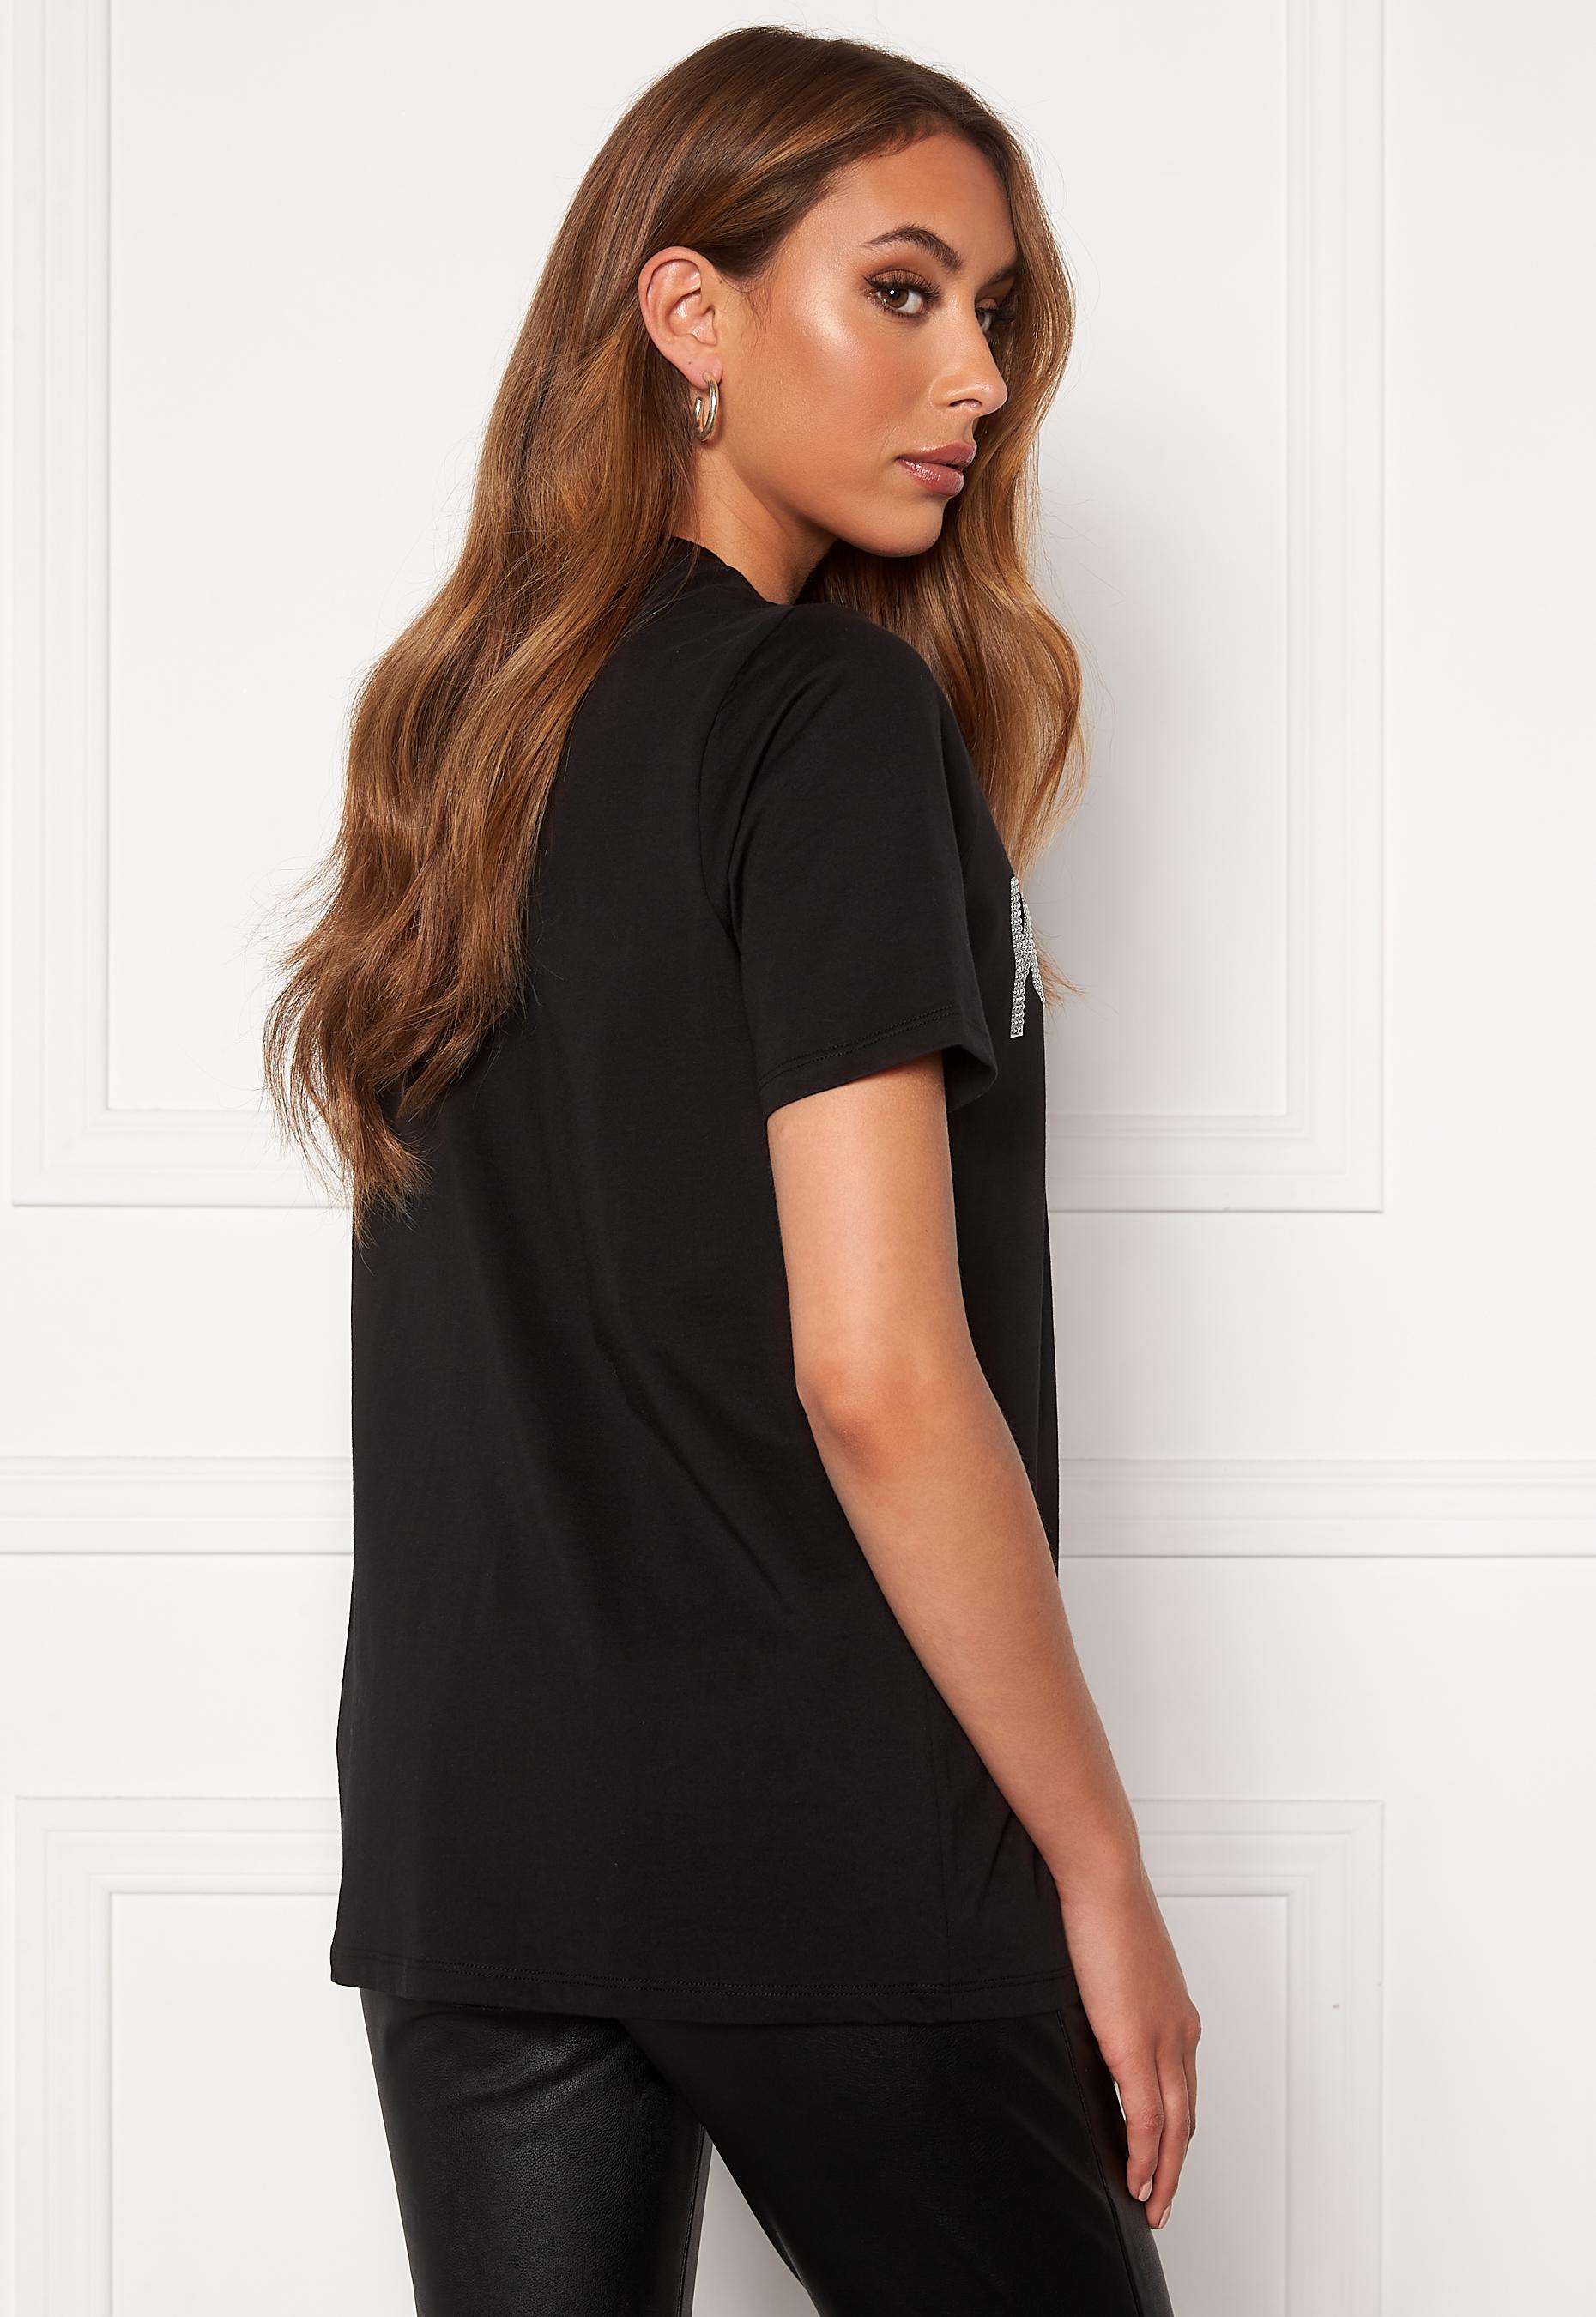 Michael Michael Kors Kors Graphic T Shirt 099 BlackSilver